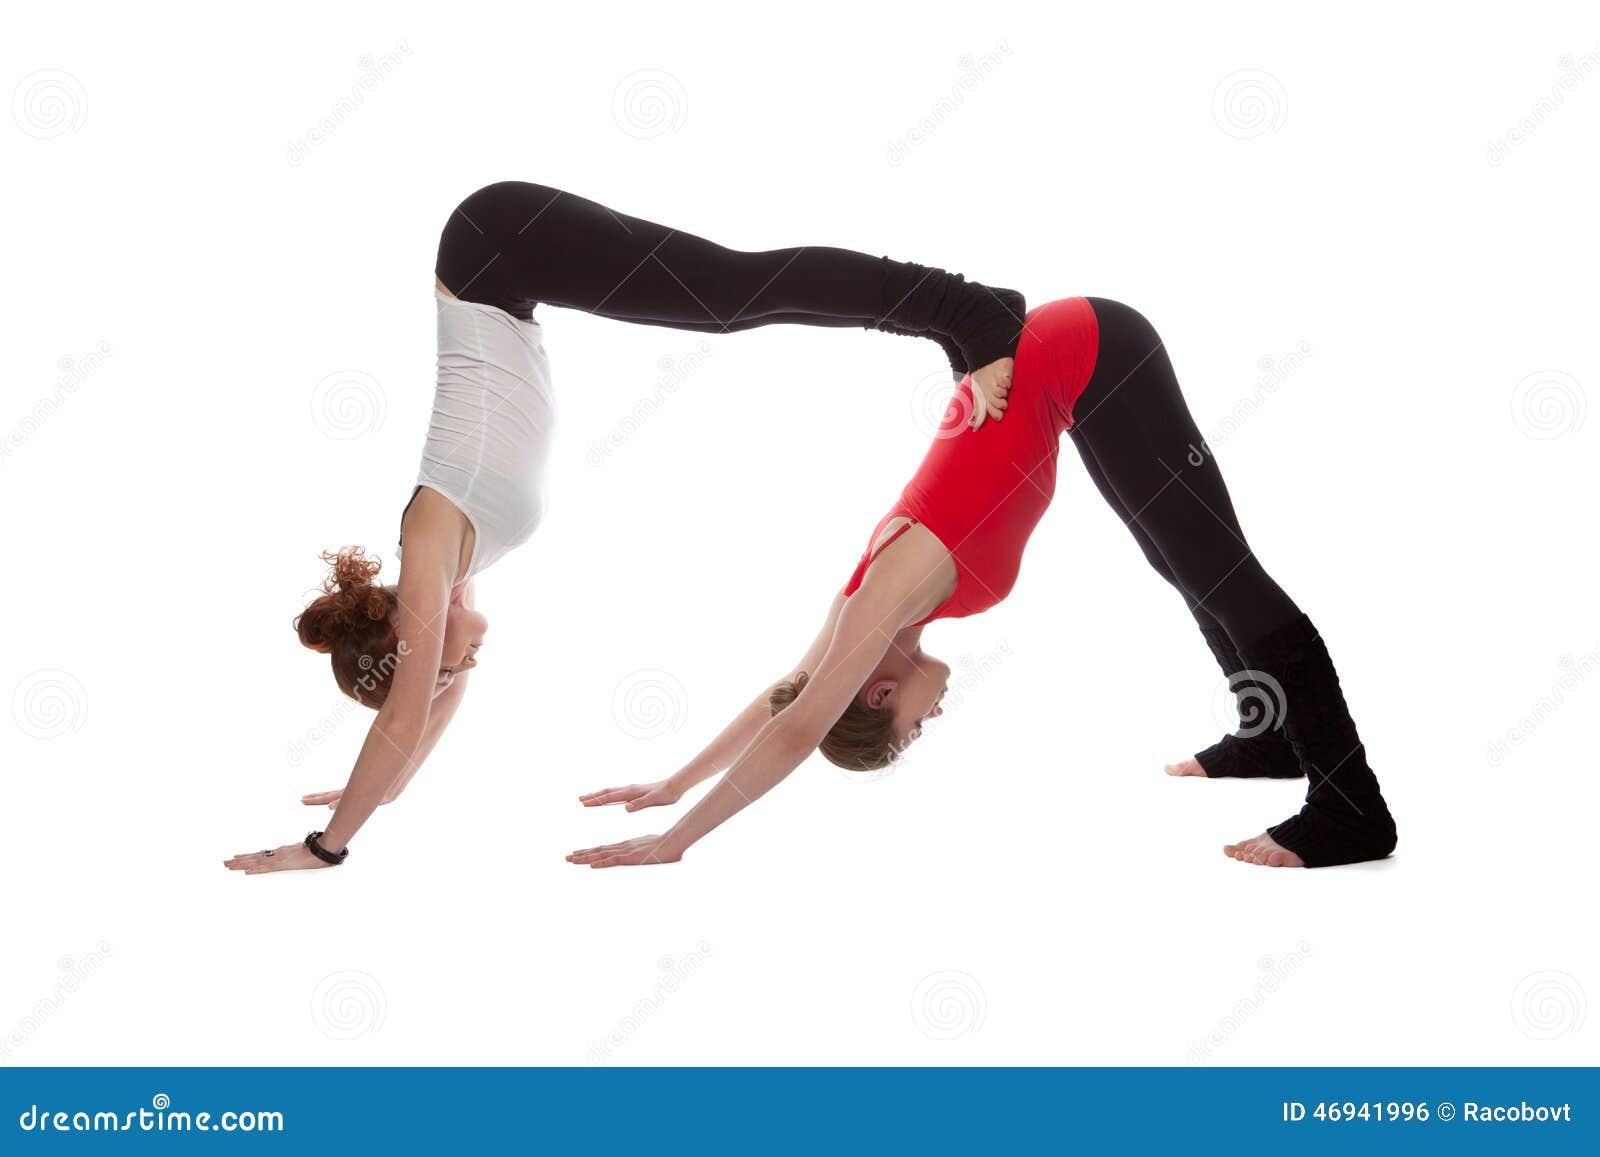 two girls doing yoga stock photo image 46941996